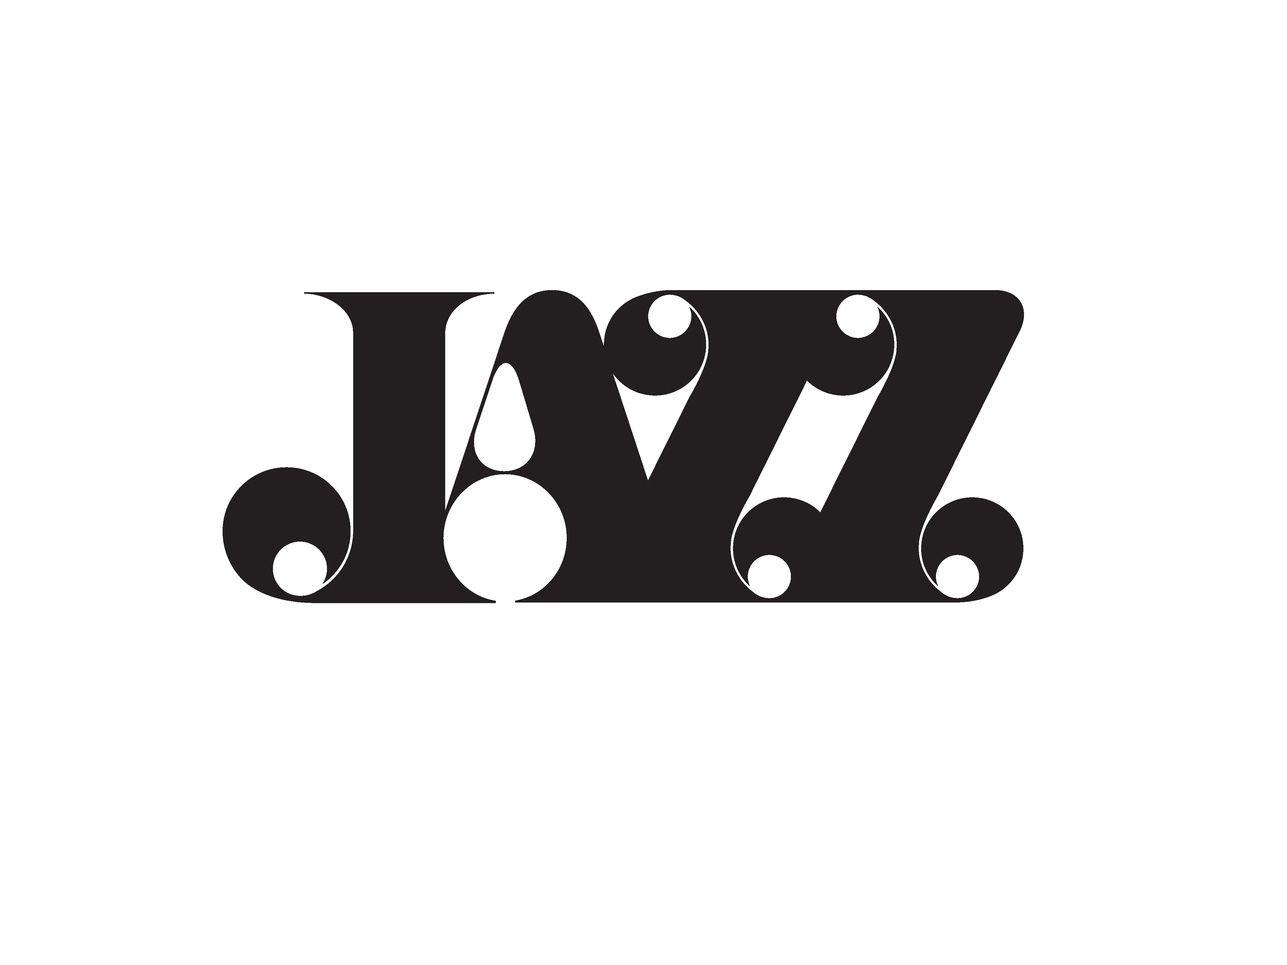 freedom jazz records by paul sych typo font oh pinterest jazz rh pinterest com jazz logos clipart jazz band logos